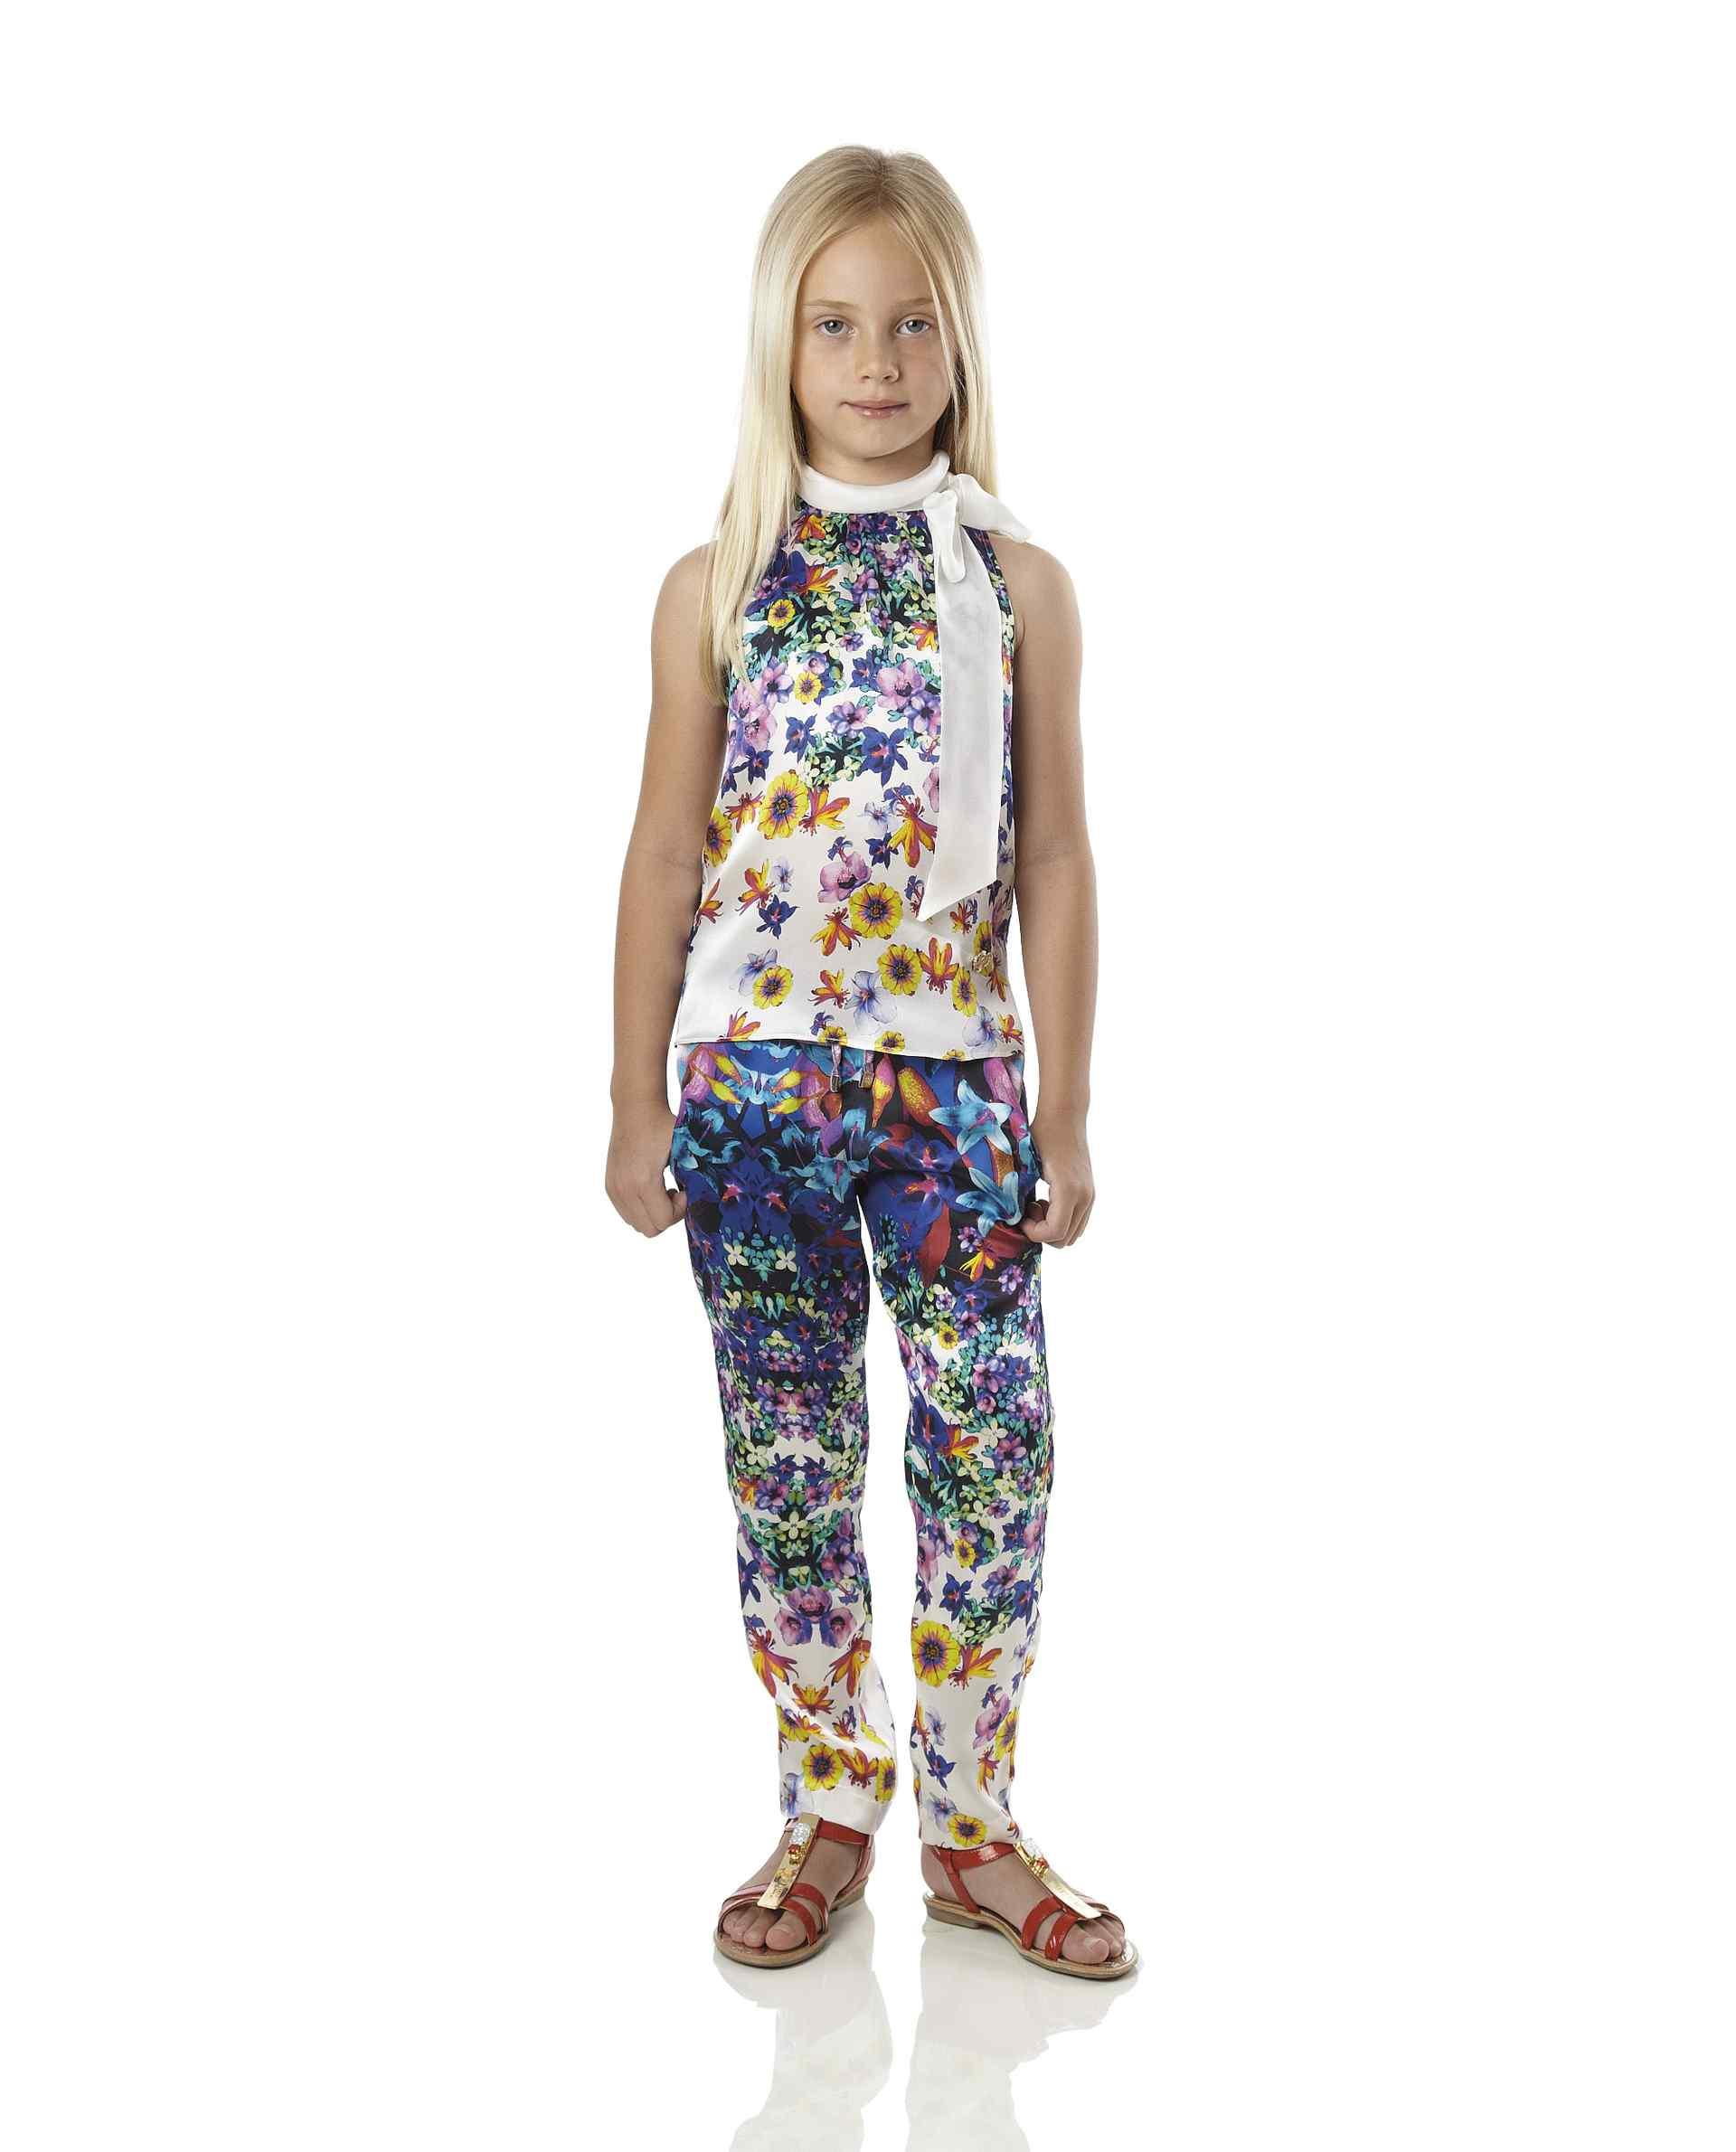 Roberto Cavalli Junior Spring Summer 2014, Artemisia tank top and trousers